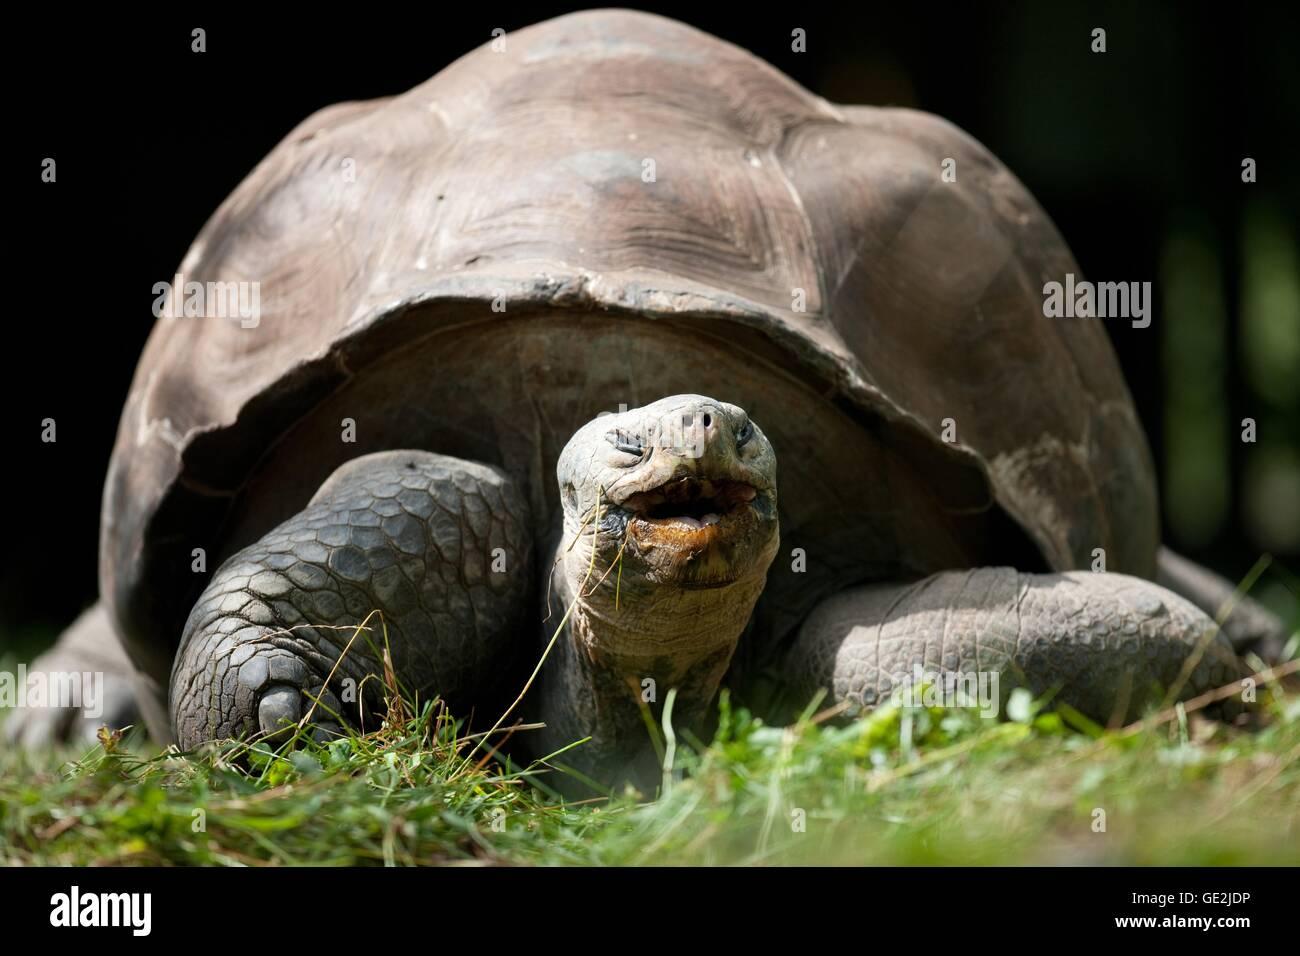 galapagos giant tortoise - Stock Image